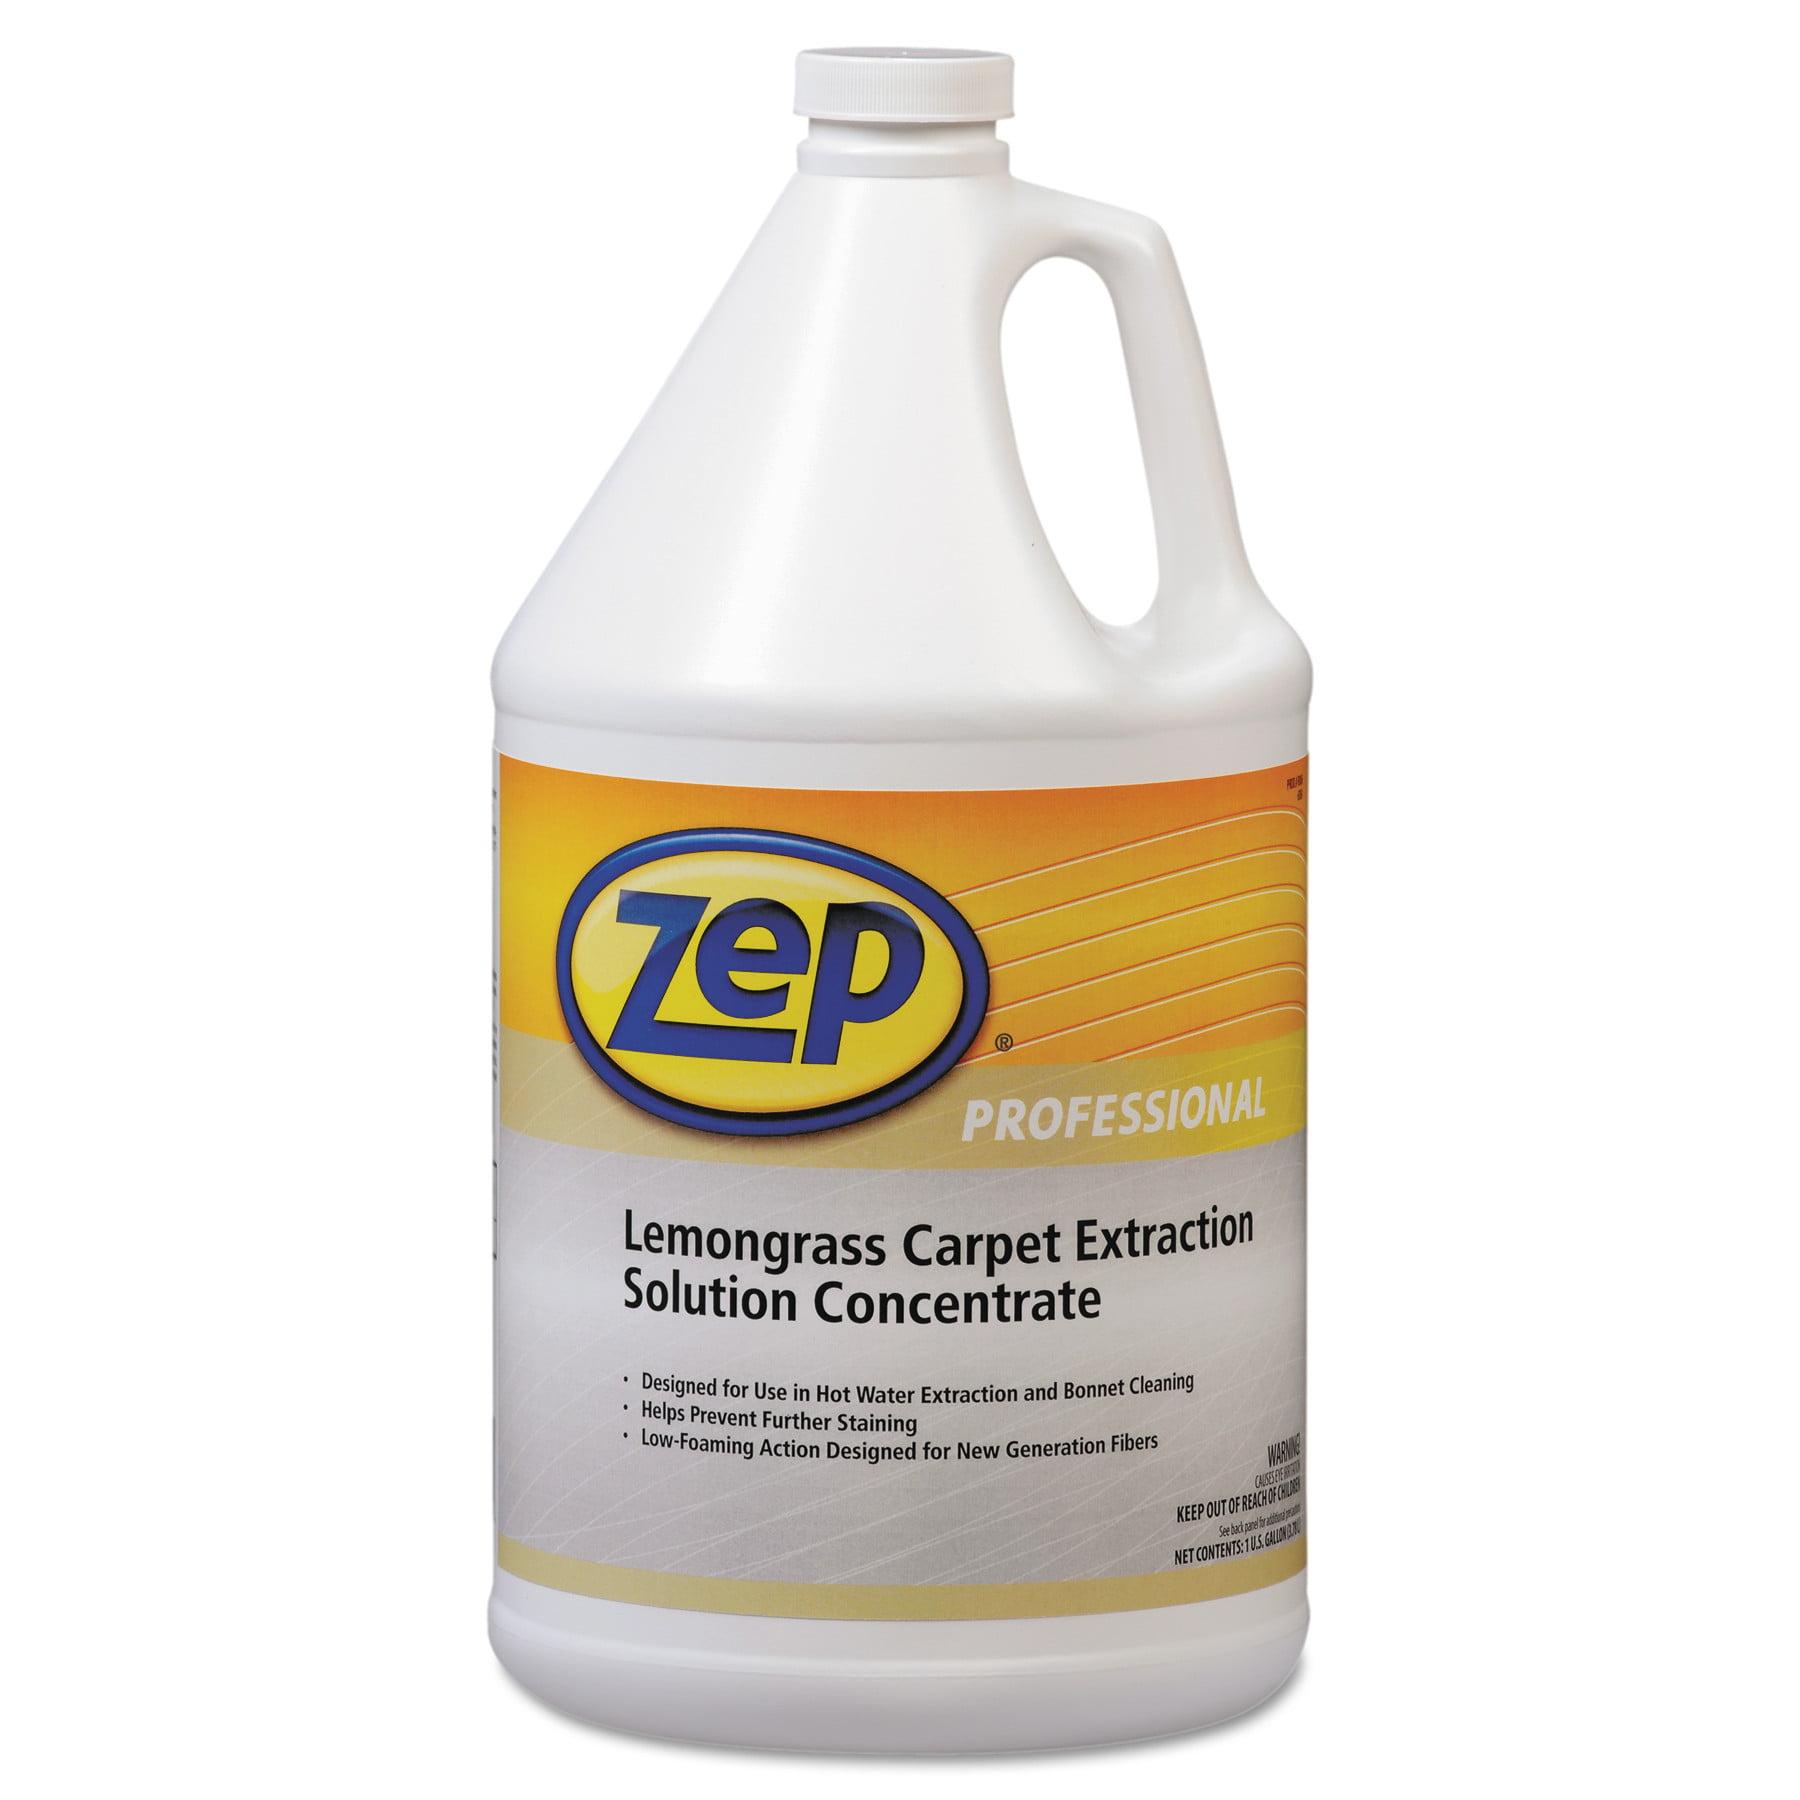 Zep Professional Carpet Extraction Cleaner, Lemongrass, 1gal Bottle